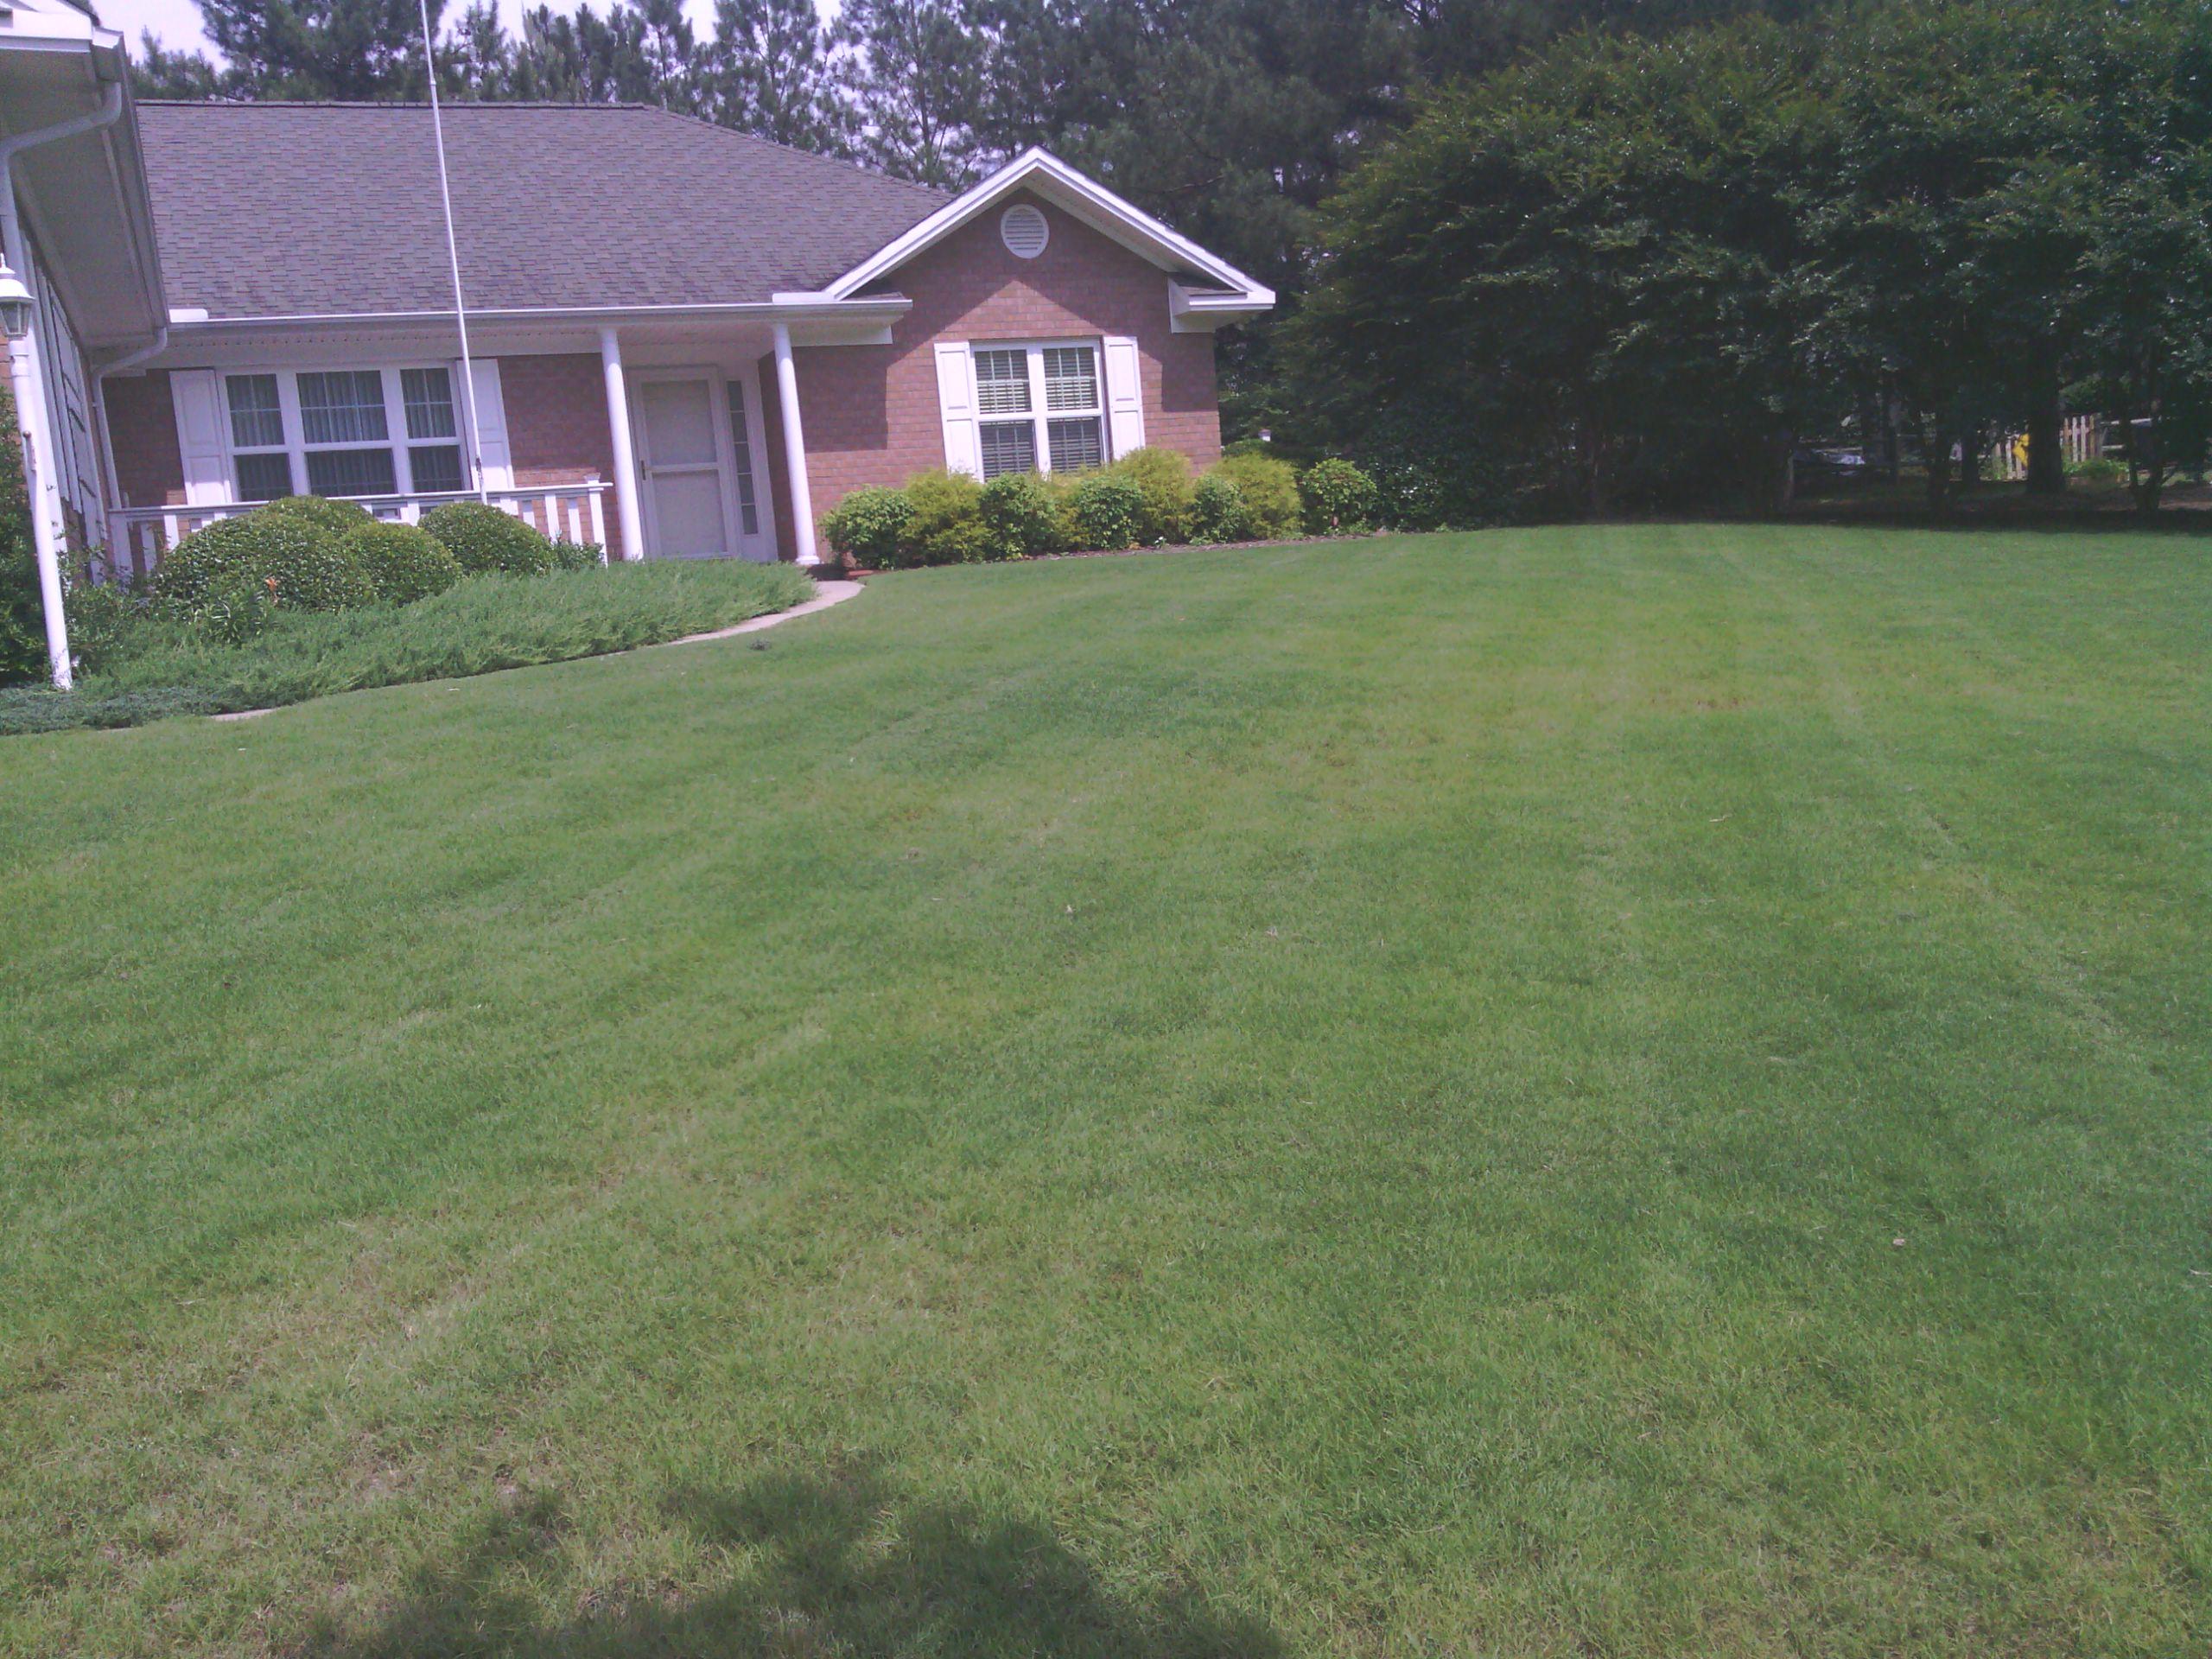 landscaping fuquay varina nc,lawn care service fuquay varina nc